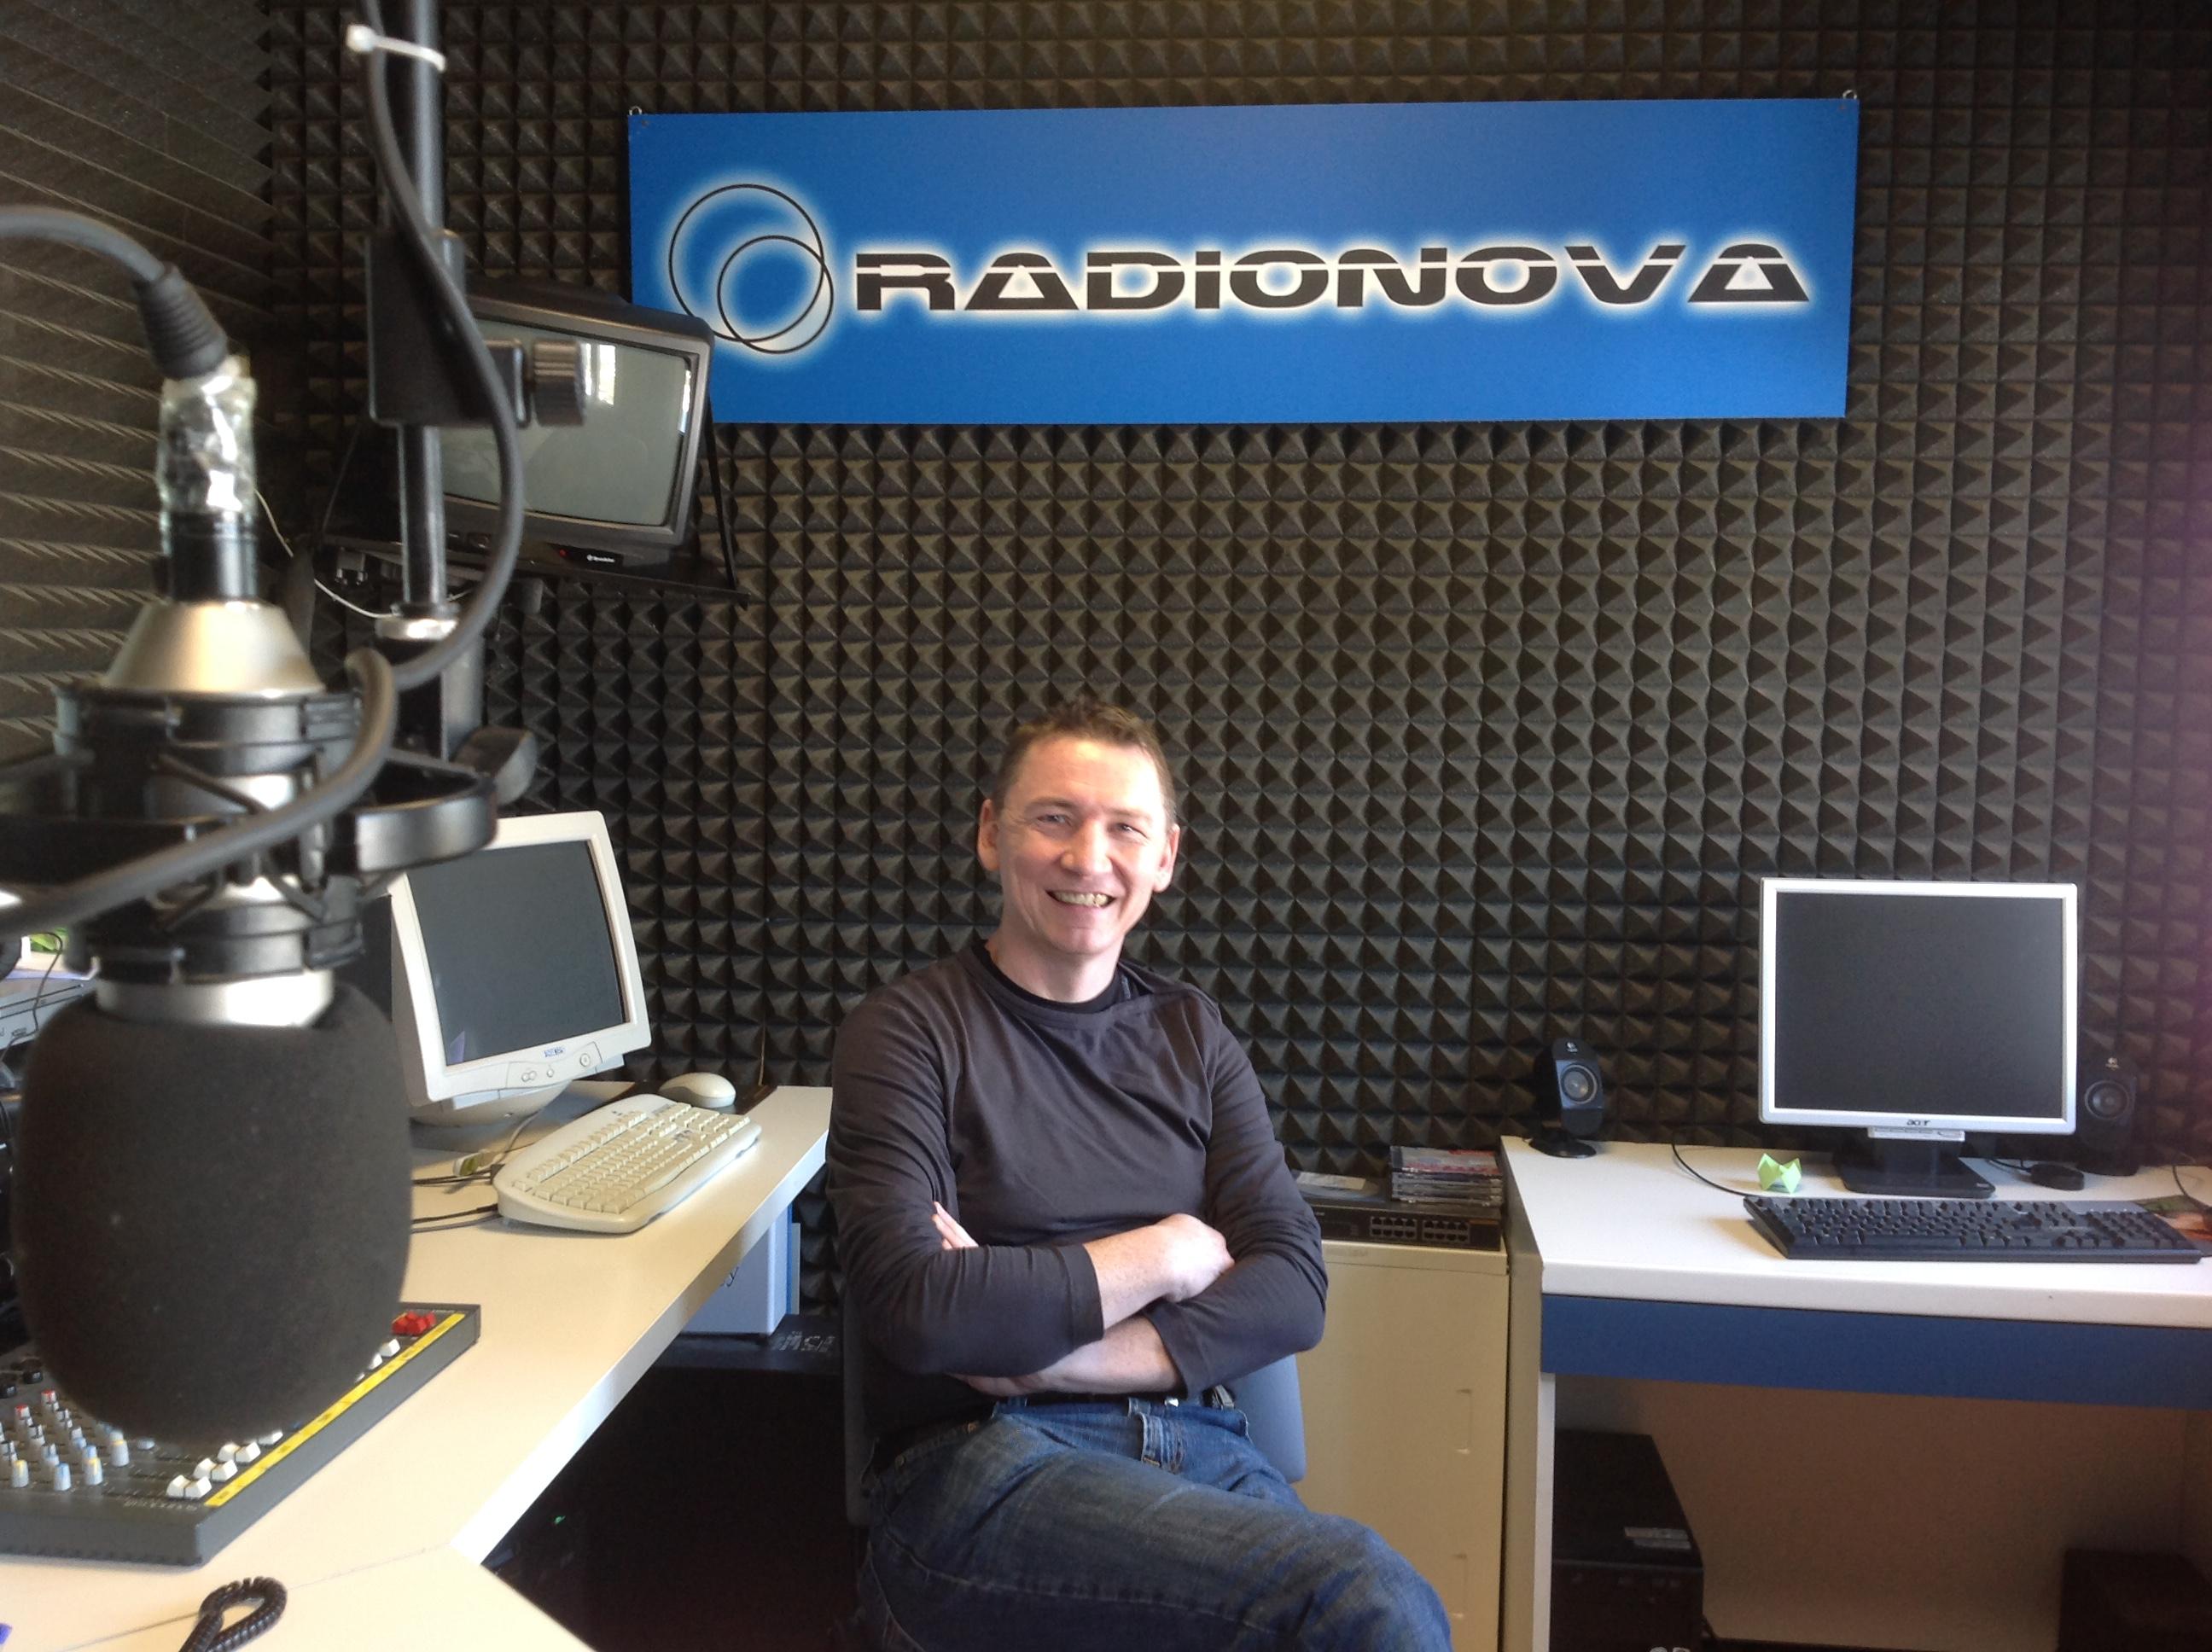 Peter Vercauteren negli studi di Radionova